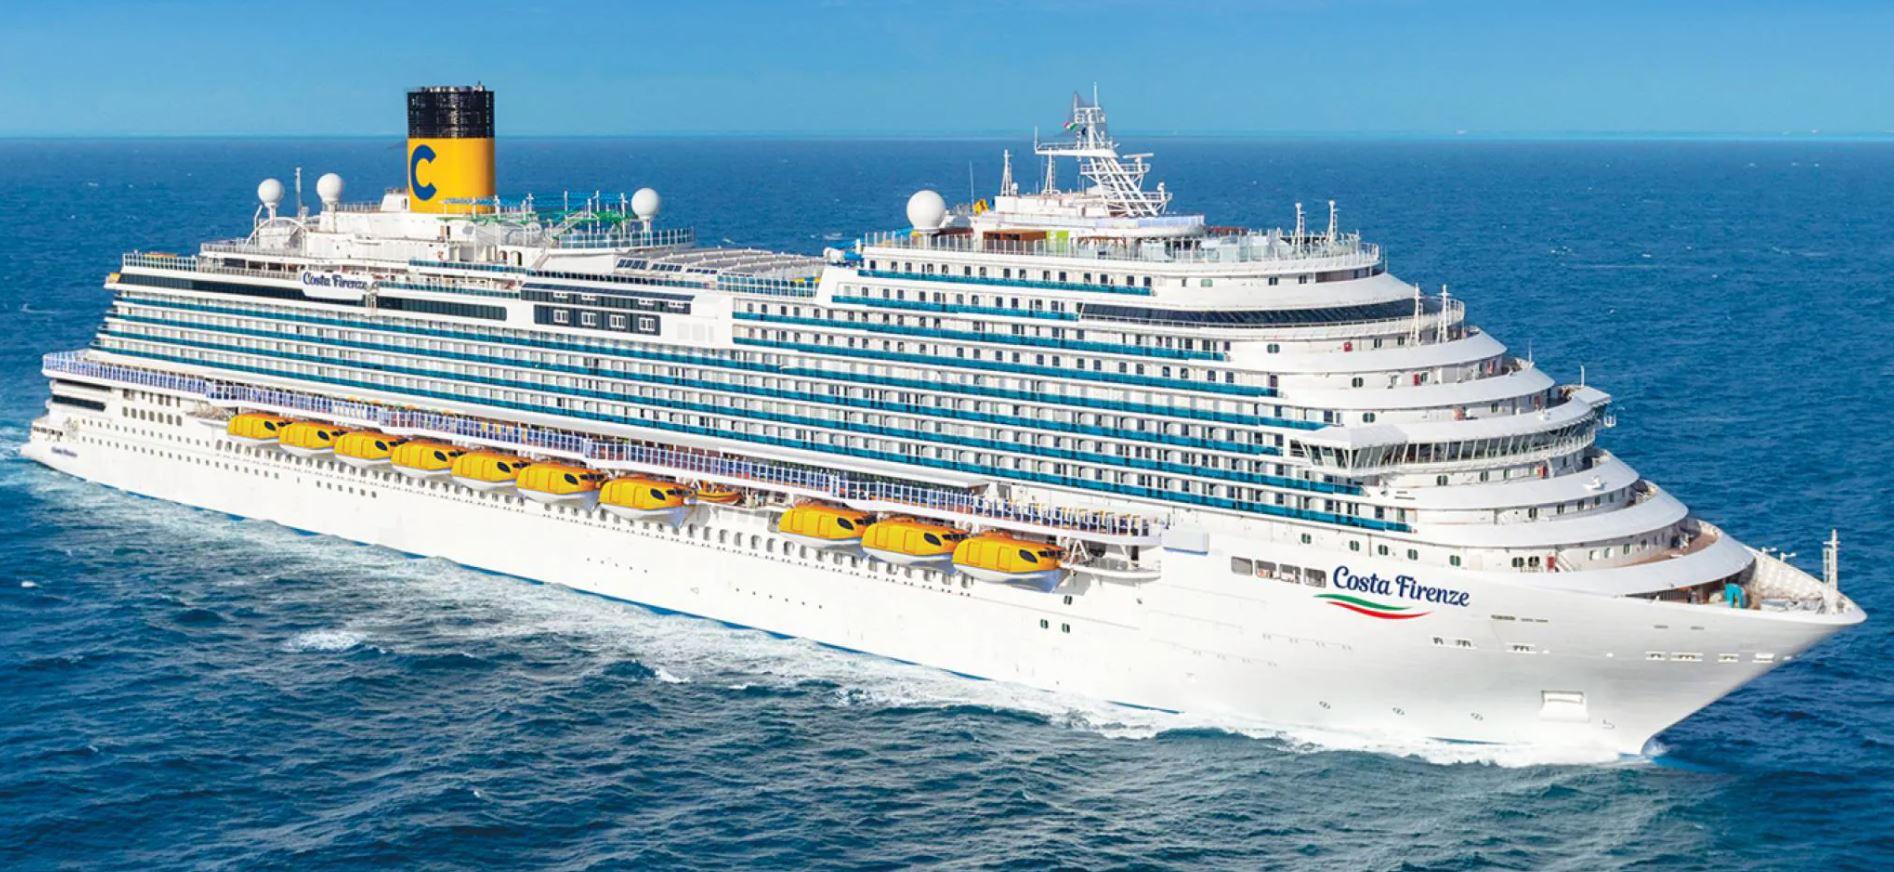 Barco Costa Firenze Crucero Ochentero 2021 B2Bviajes